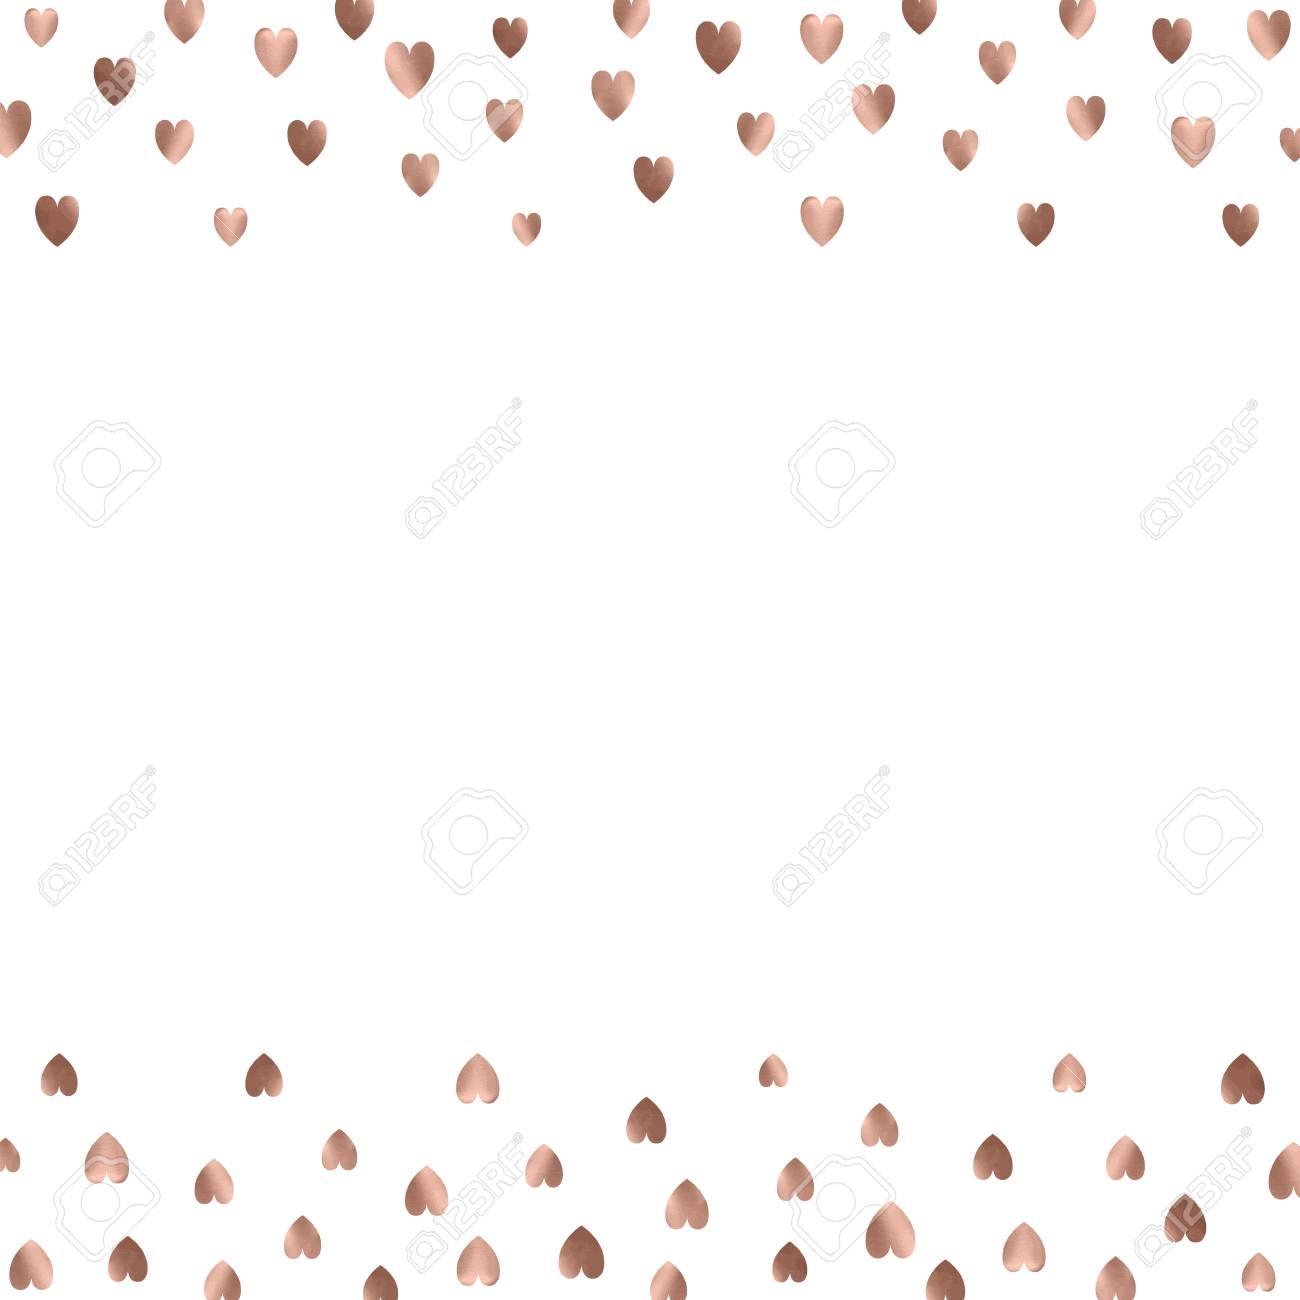 Rose Gold Glitter Beautiful Fashion Romantic Background Polka Hearts Vector Pink Golden Dots Confetti